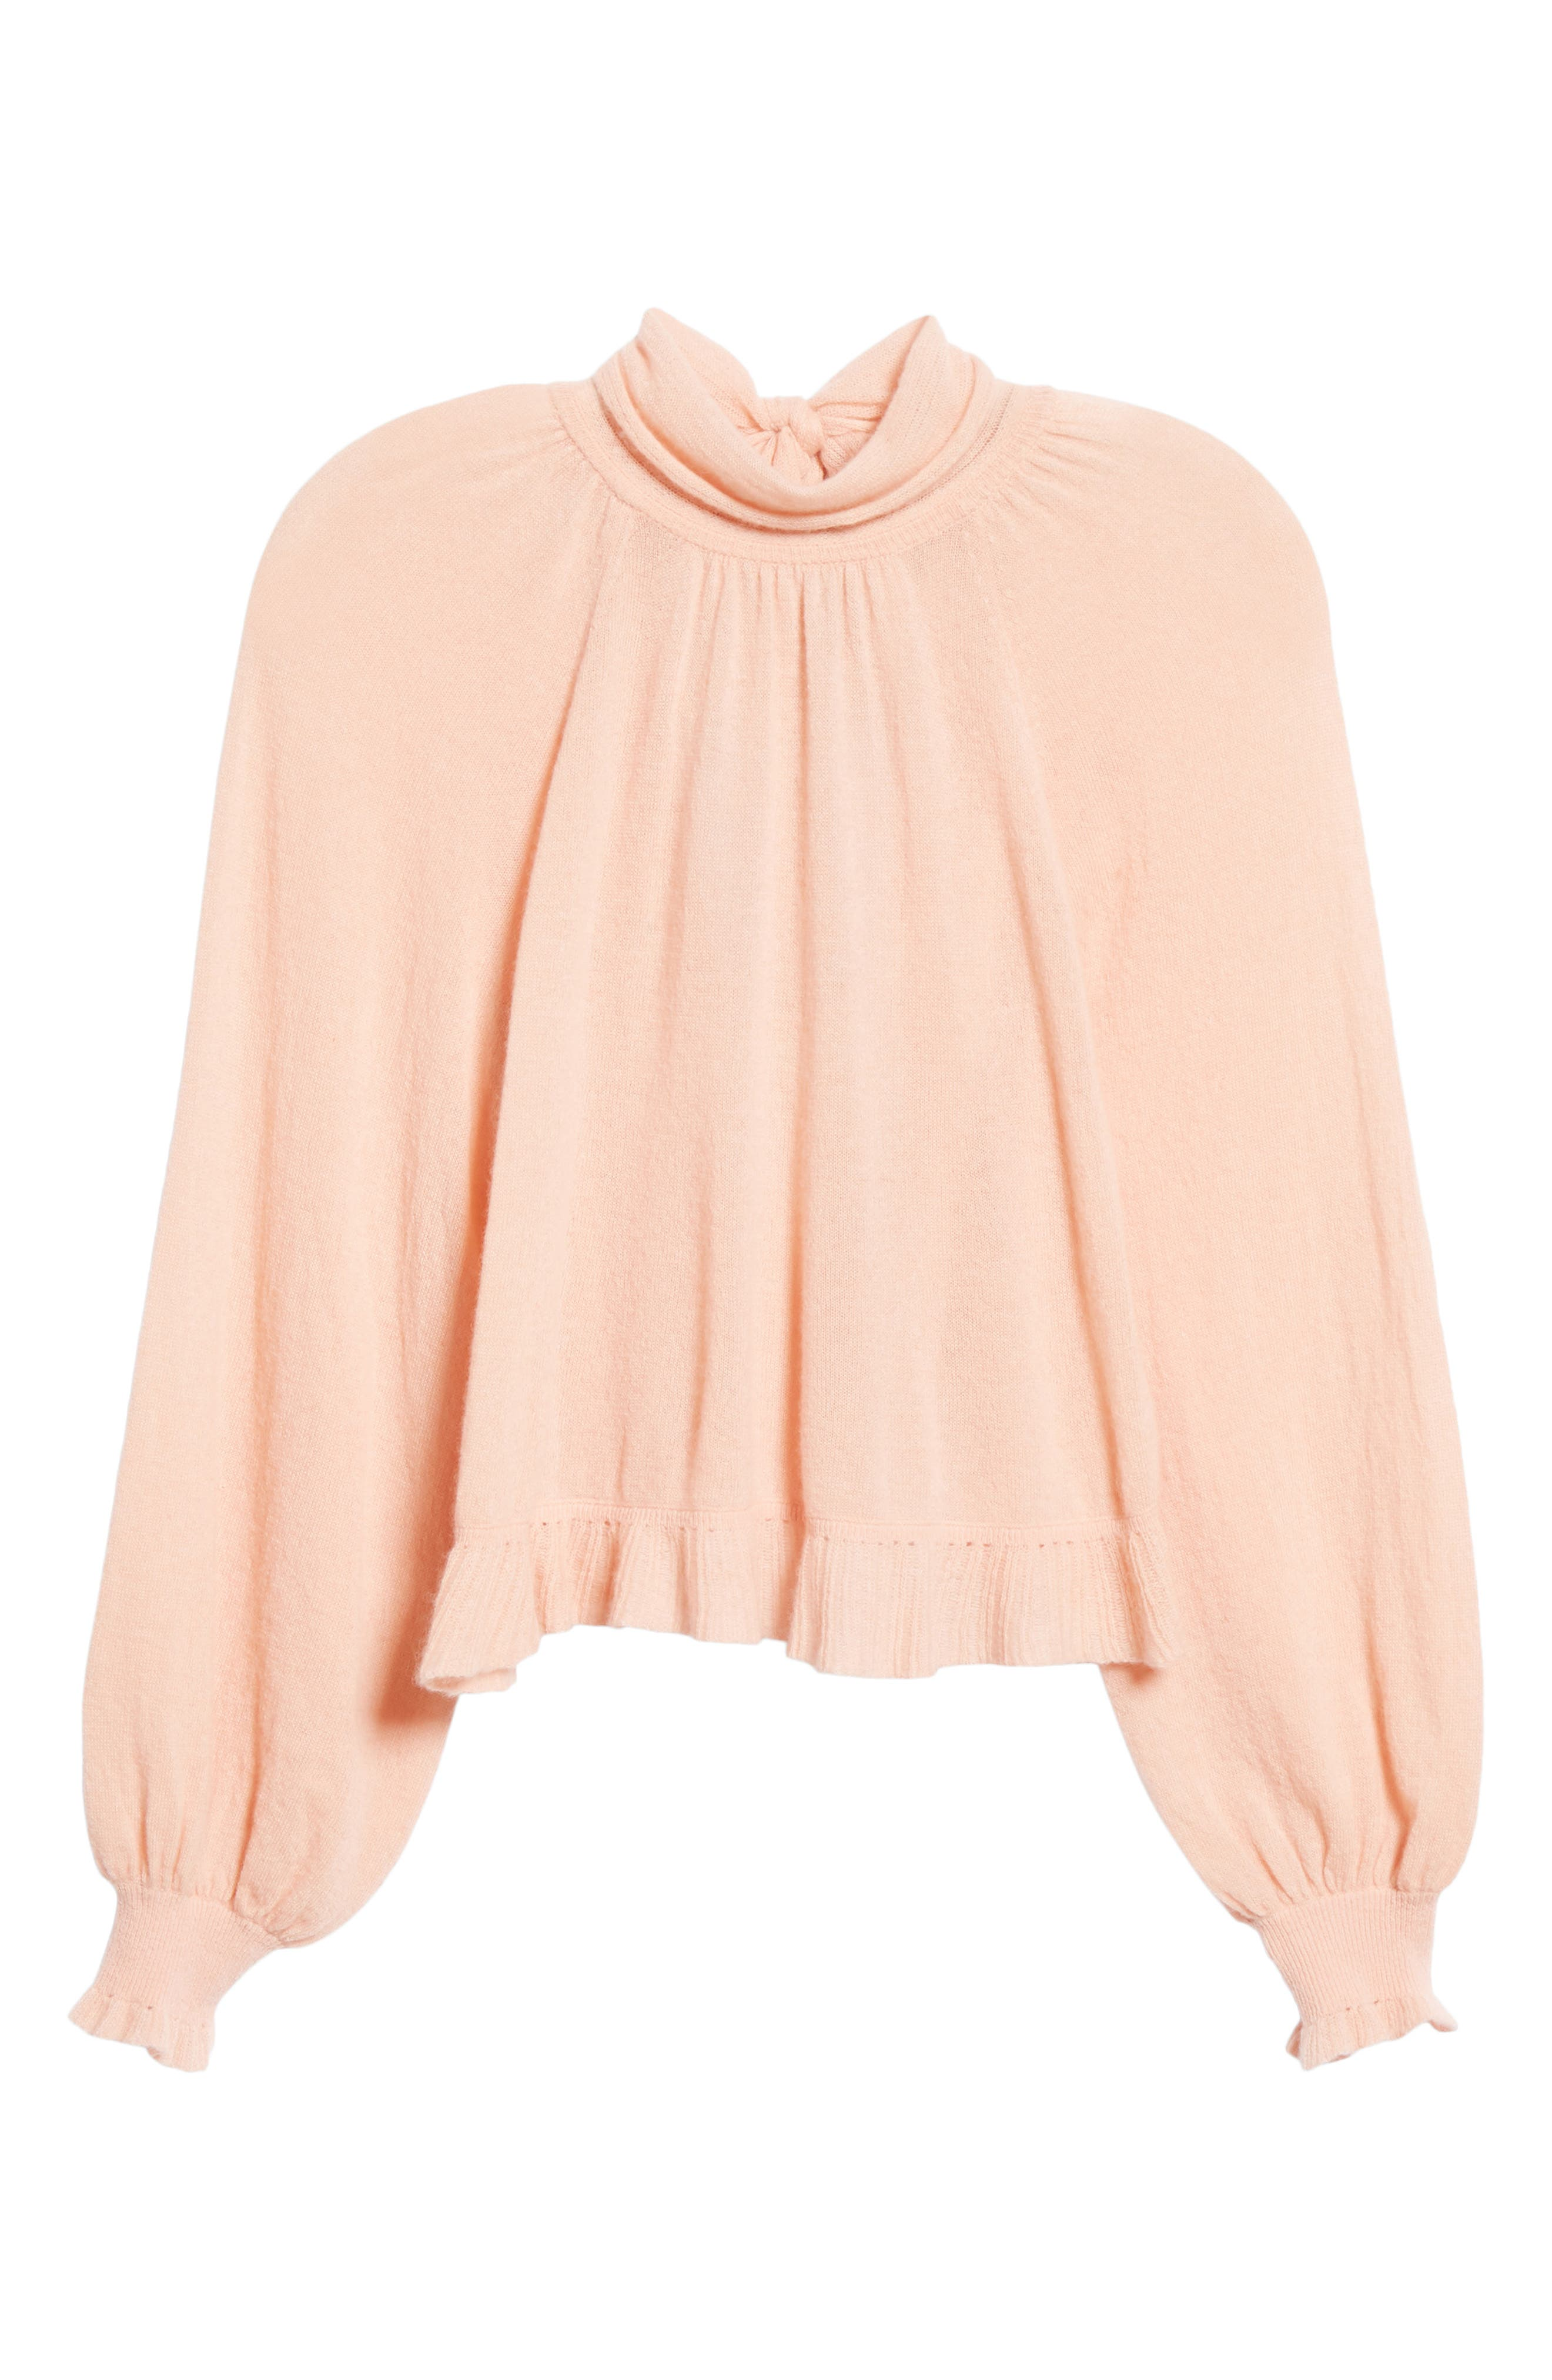 Clover Tie Back Cashmere Blend Sweater,                             Alternate thumbnail 6, color,                             ROSE